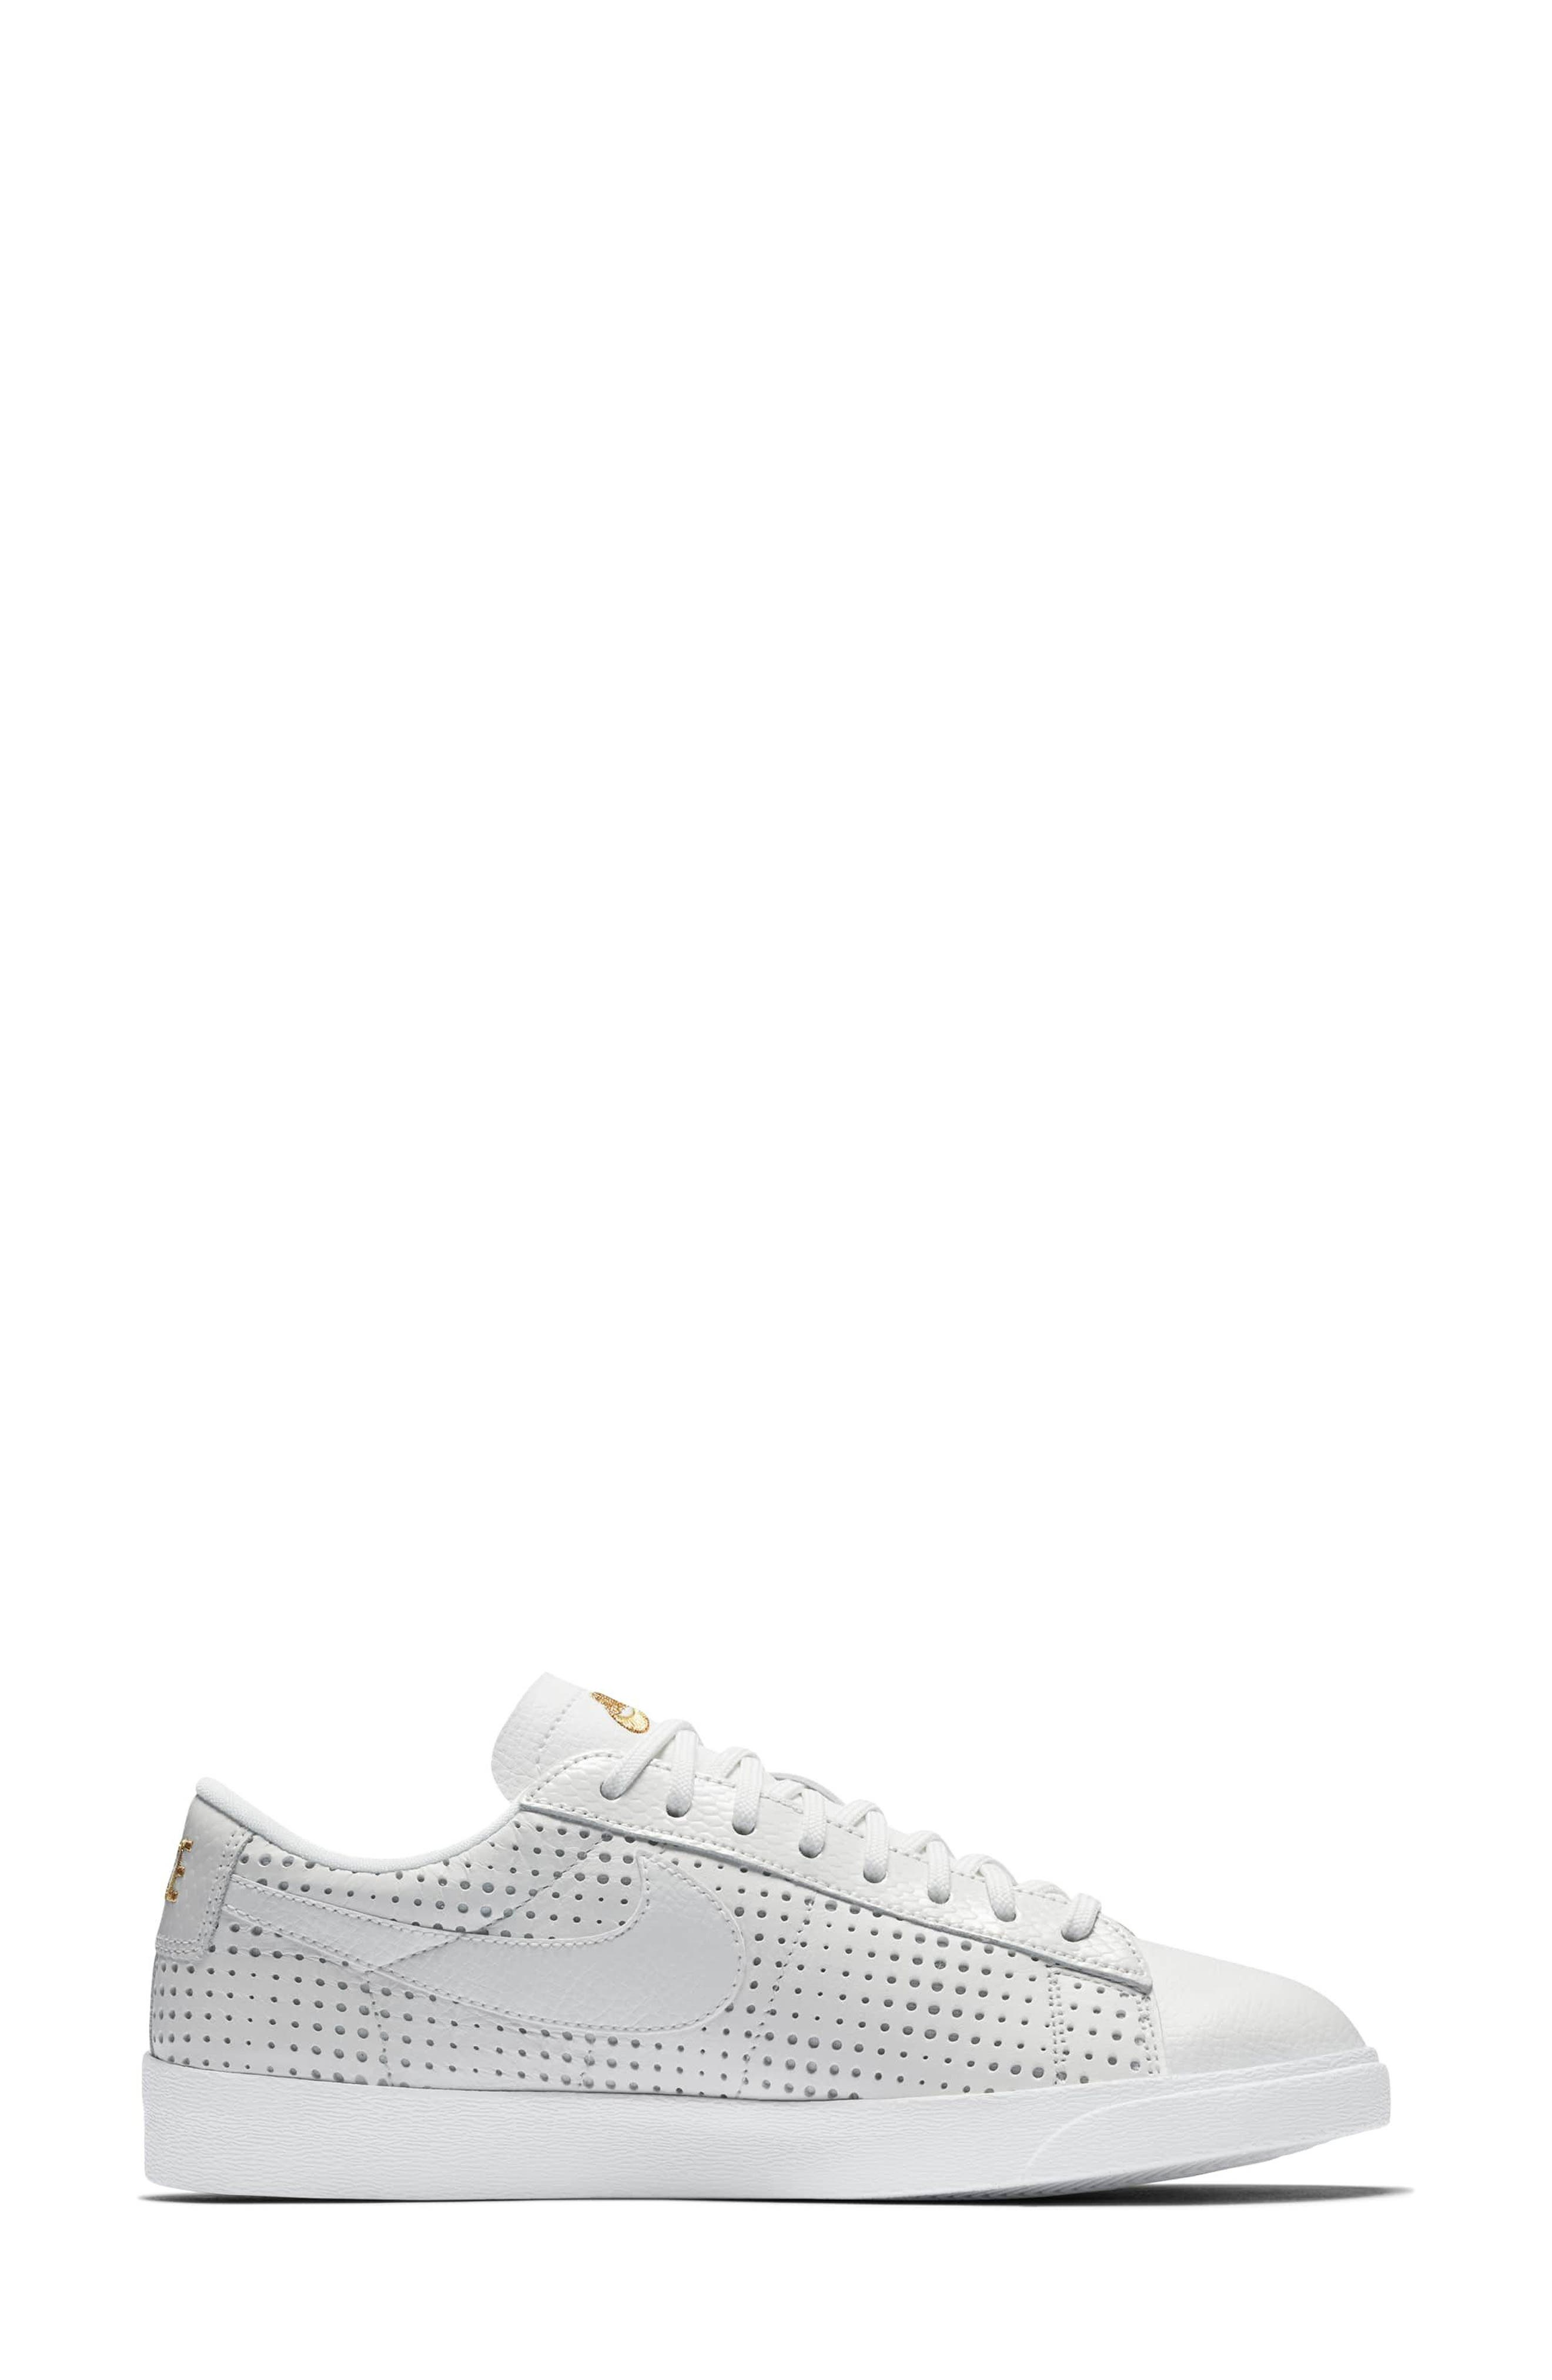 Main Image - Nike Blazer Low Top Sneaker SE (Women)